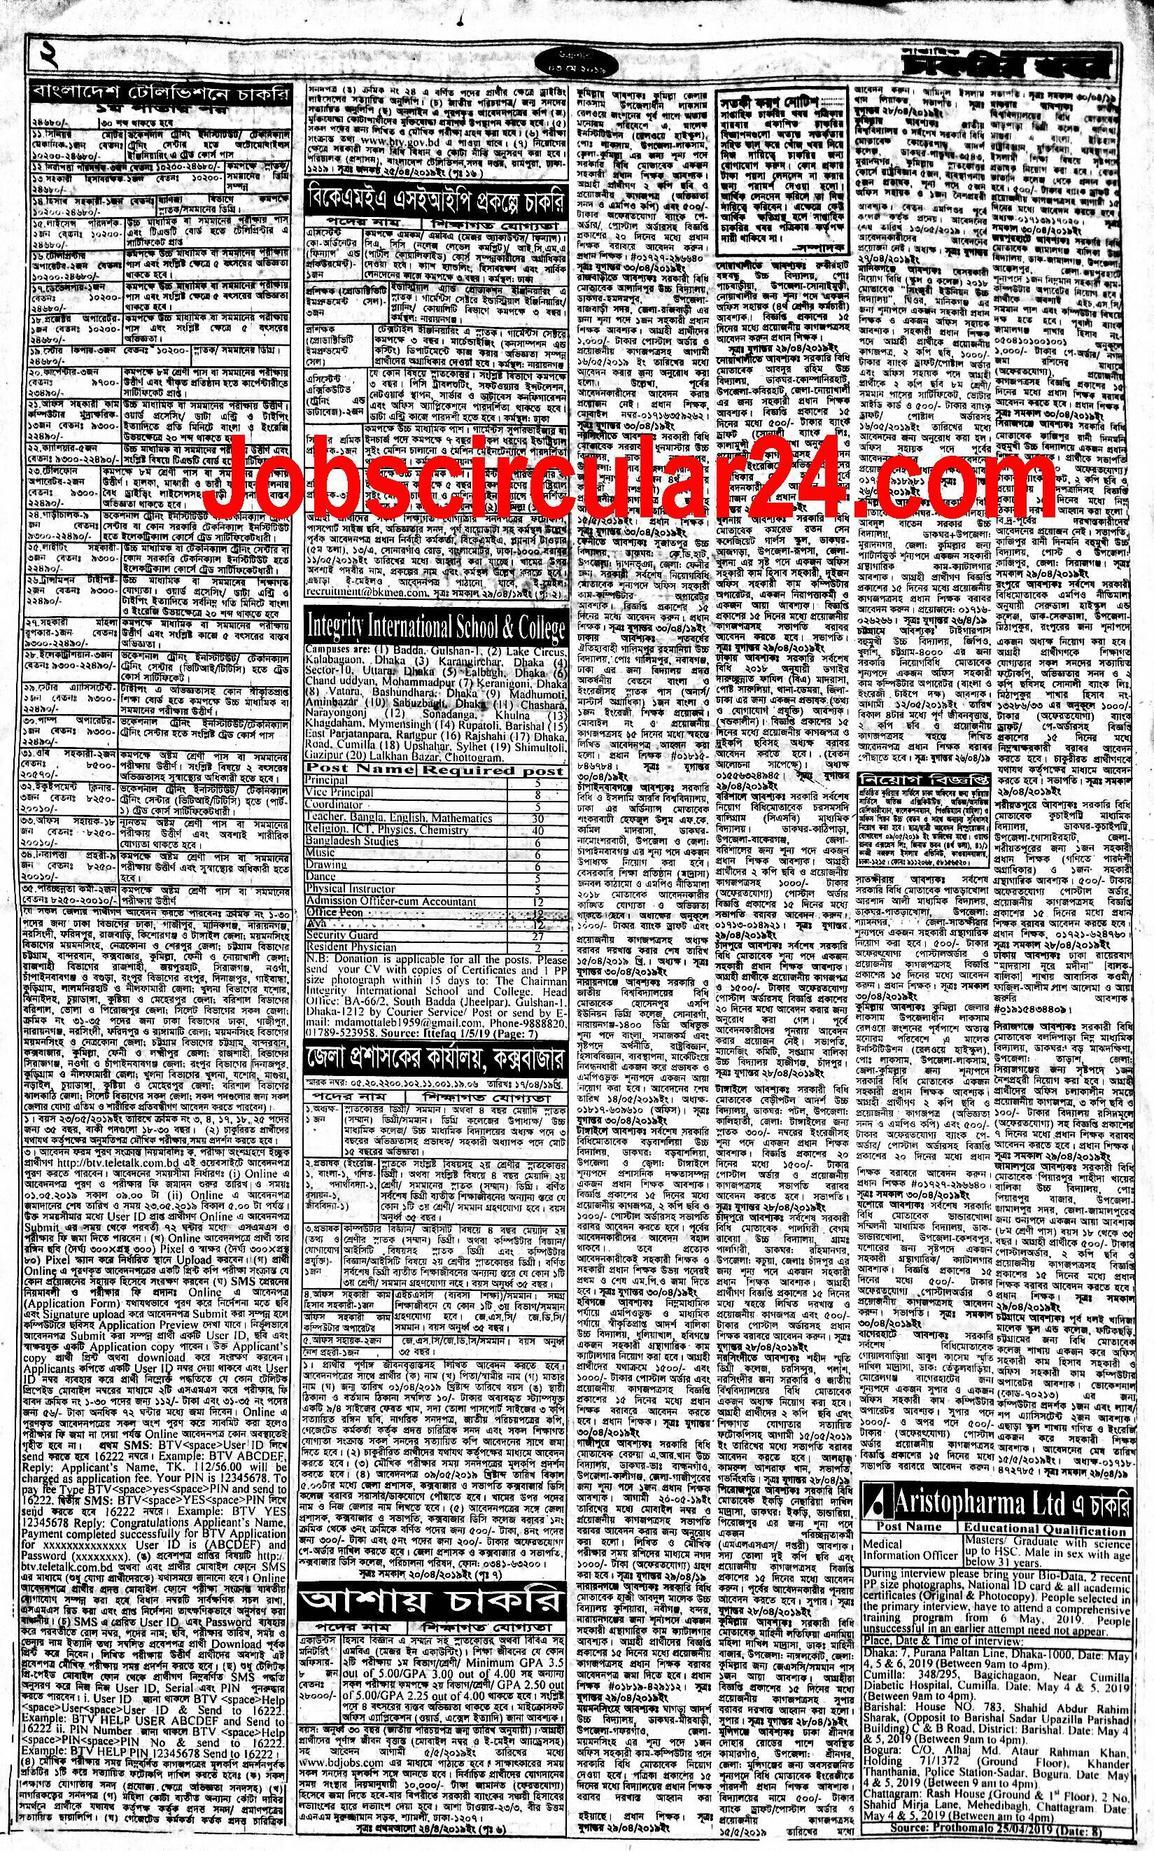 Weekly Job Newspaper 10 May 2019: সাপ্তাহিক চাকরির খবর